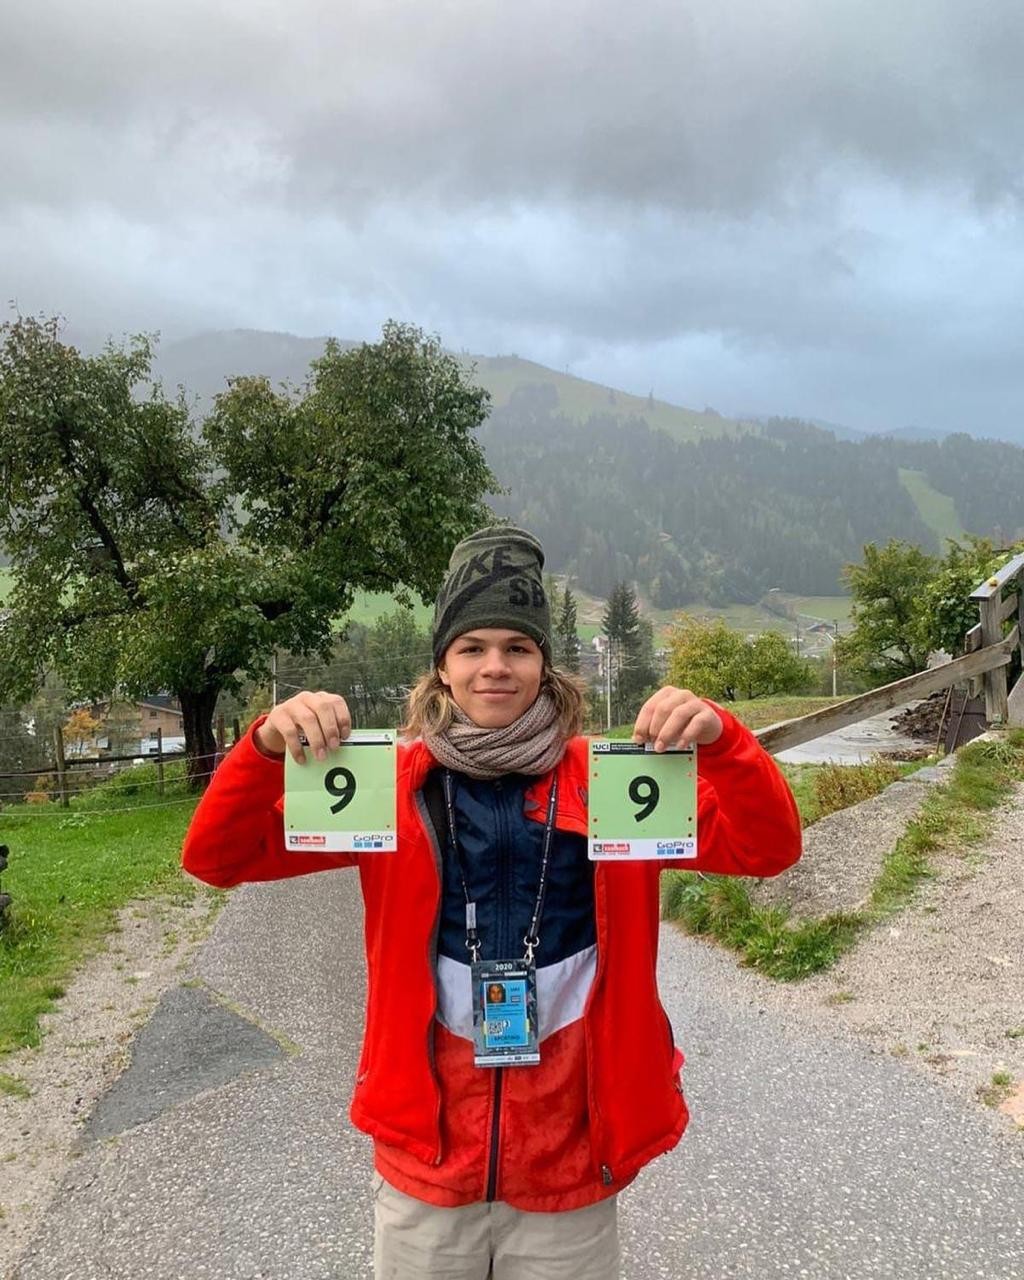 El costarricense, Pablo Aguilar, finalizó noveno en Mundial de Downhill.